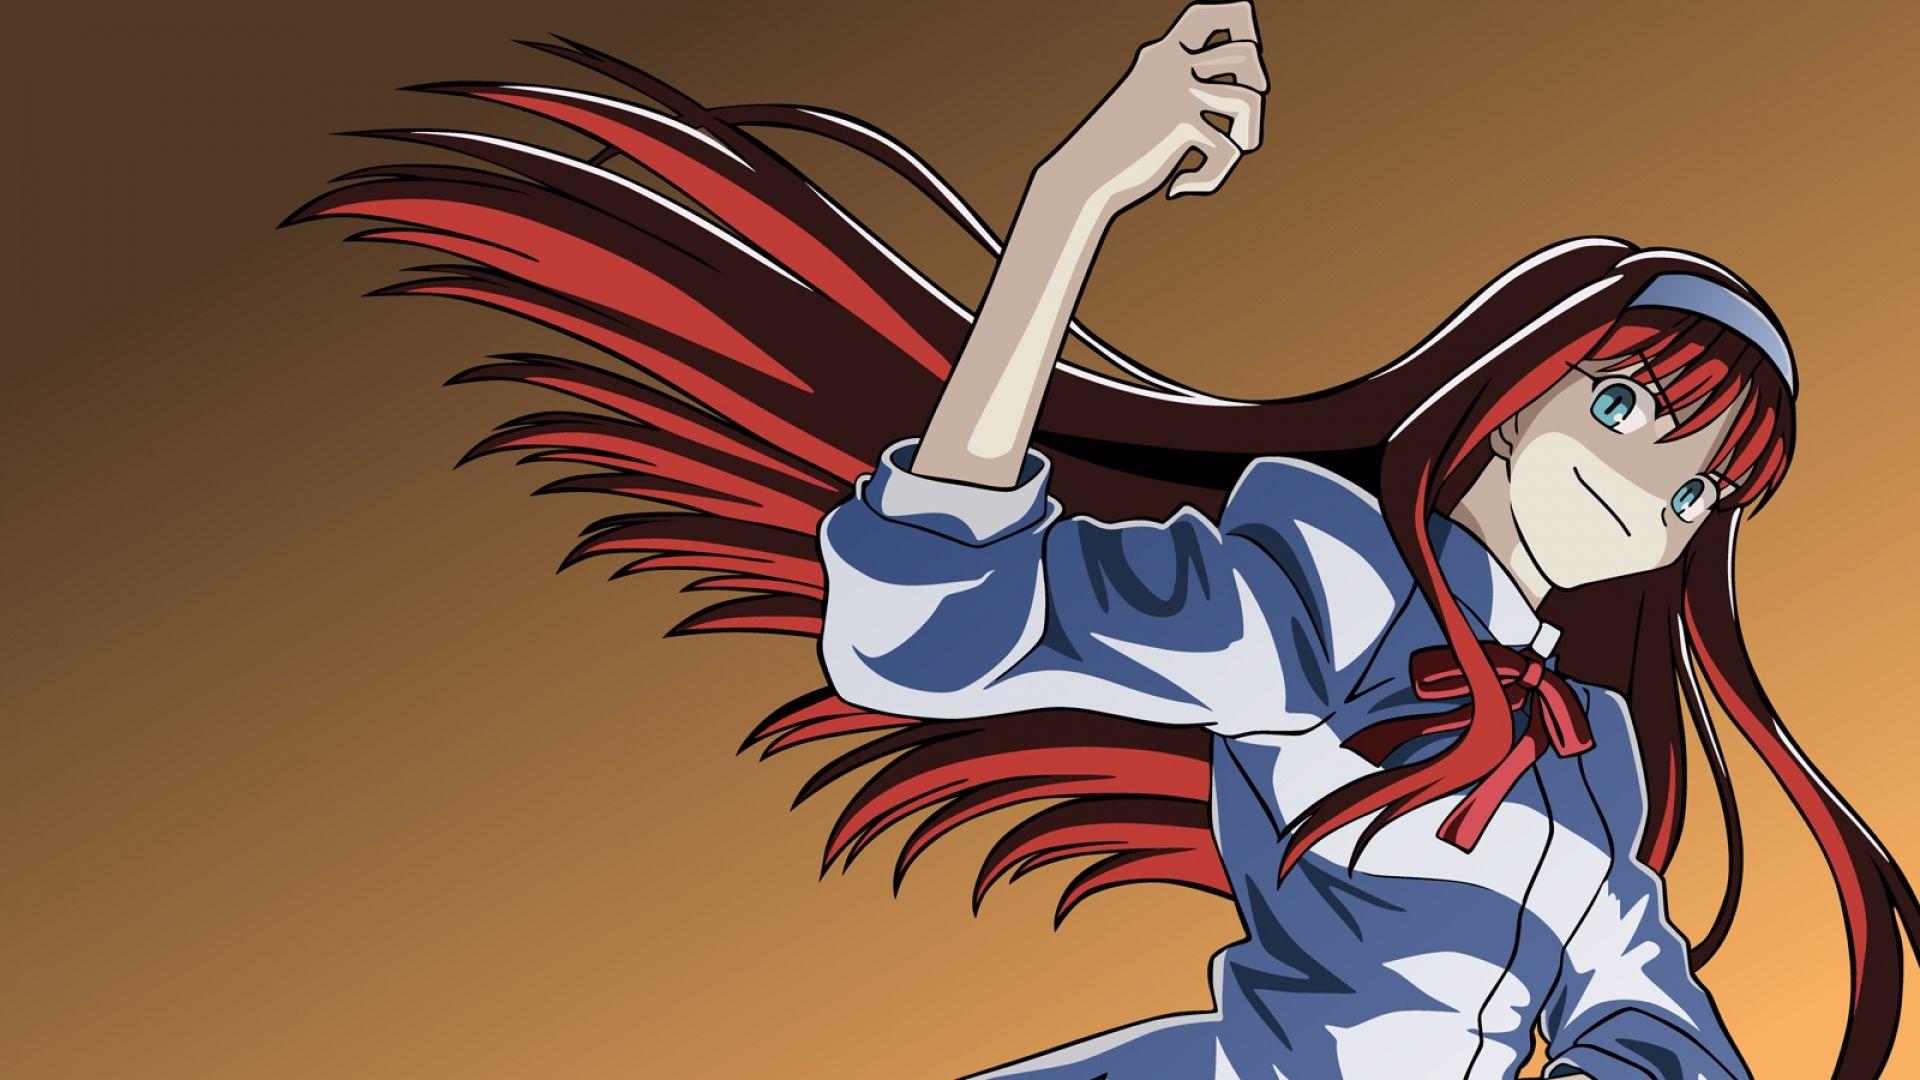 shingetsutan tsukihime, melty blood, tohno akiha - http://www.wallpapers4u.org/shingetsutan-tsukihime-melty-blood-tohno-akiha/